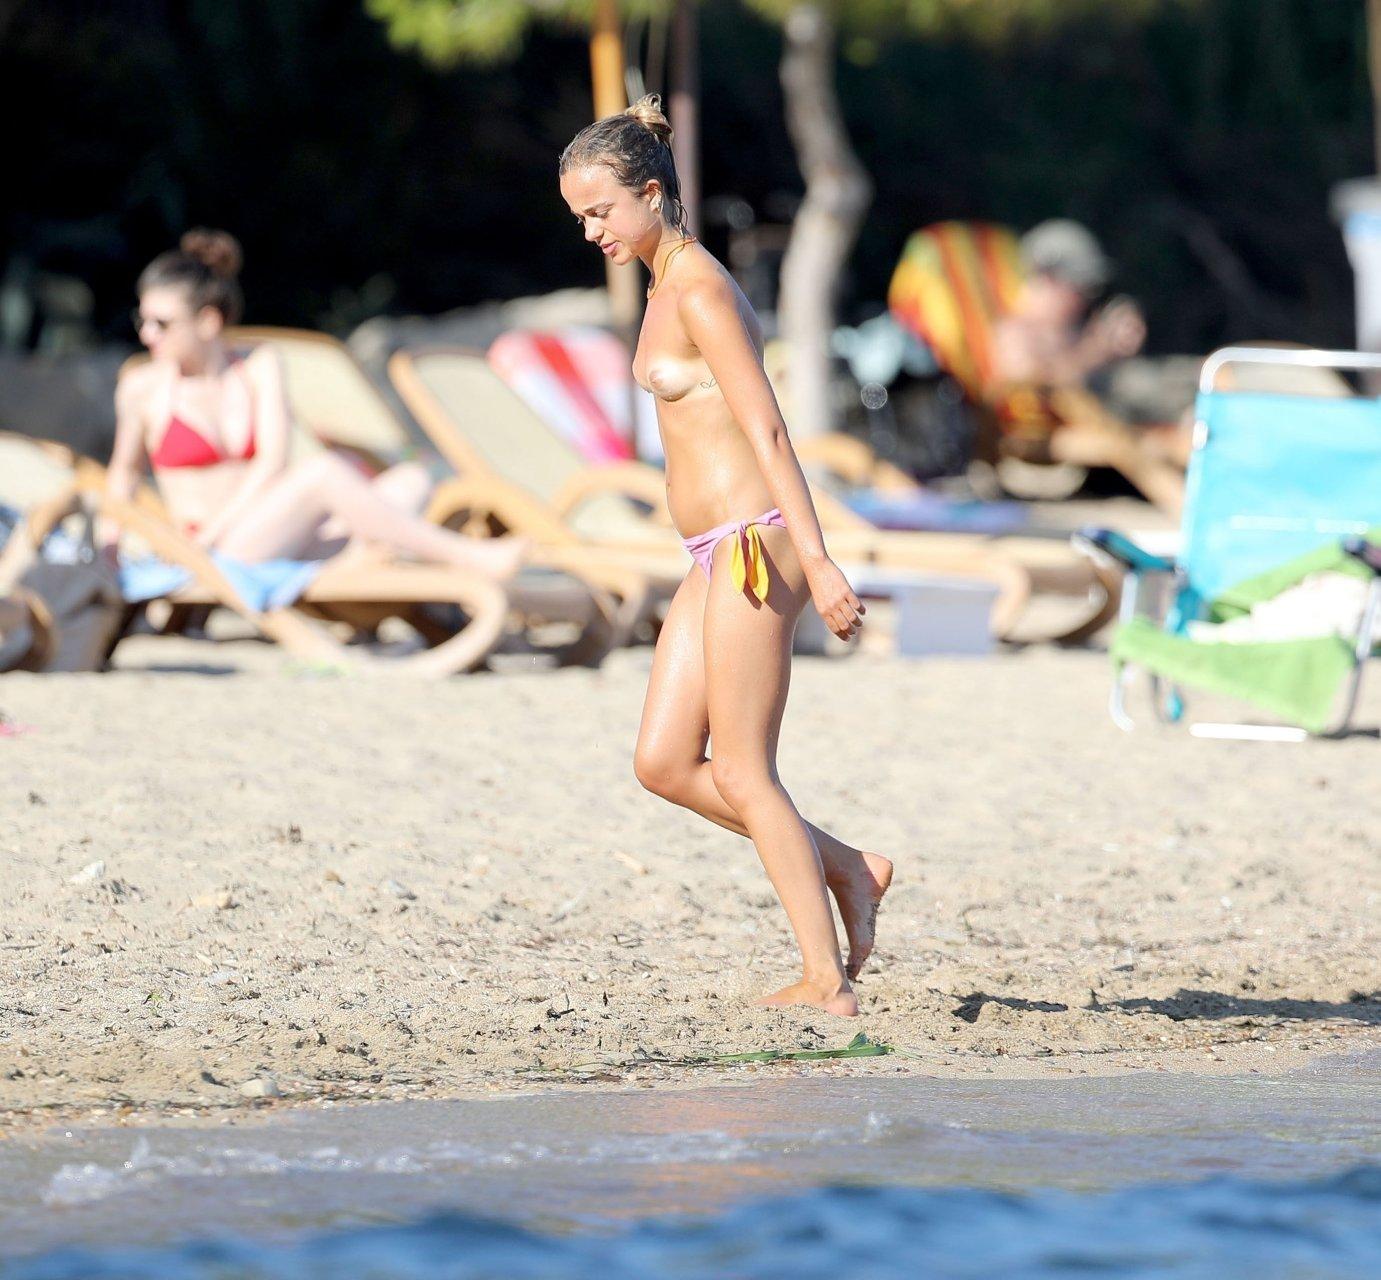 Lady-Amelia-Windsor-Sexy-Topless-TheFappeningBlog.com-27.jpg